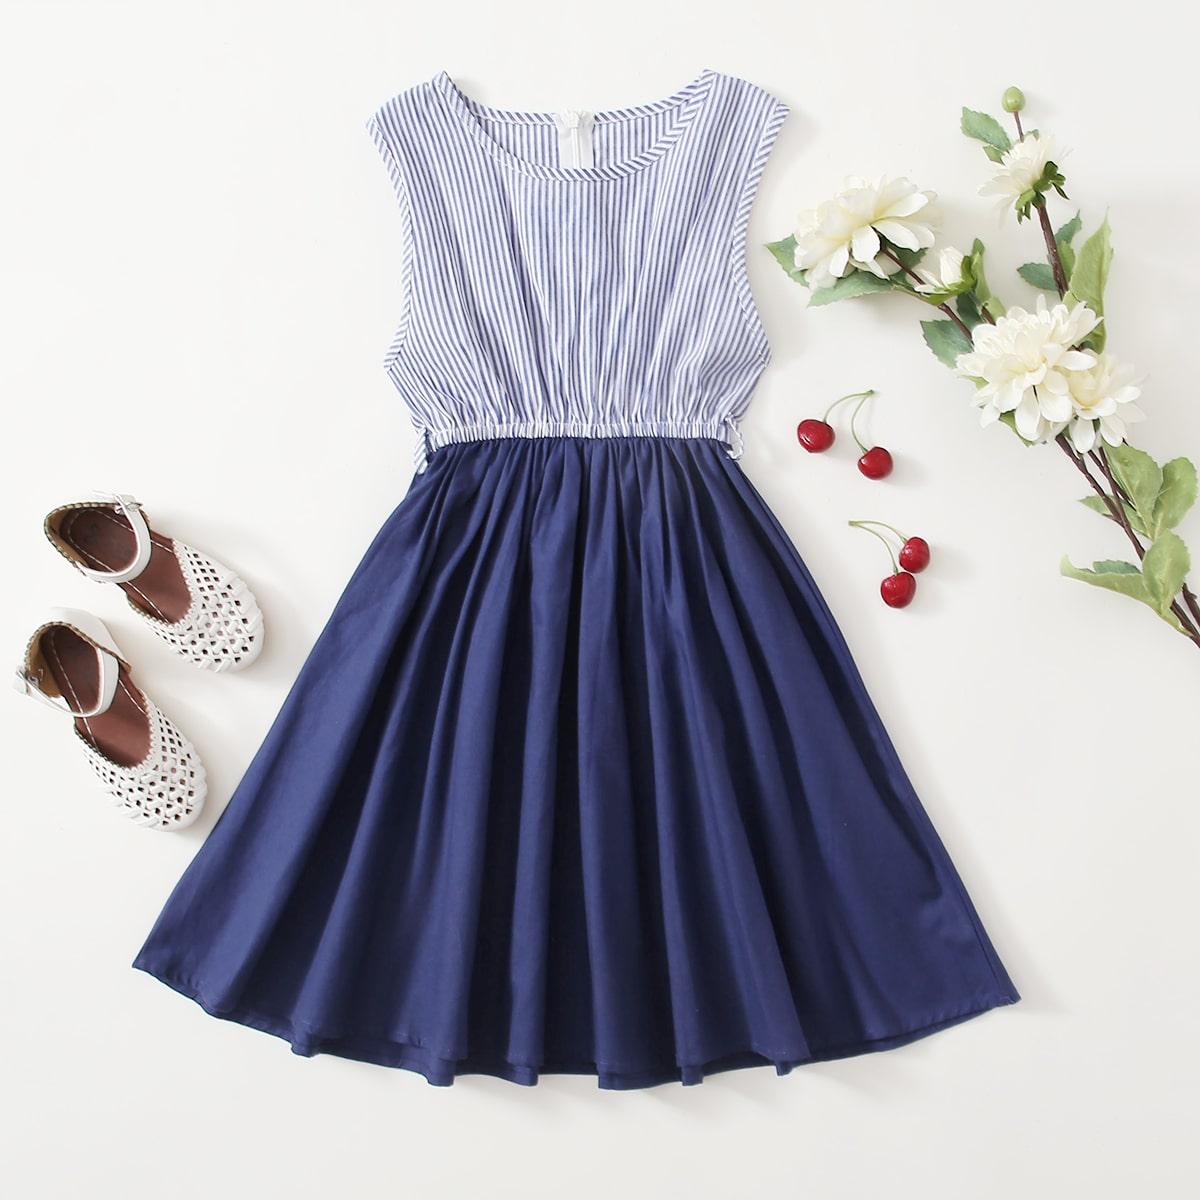 A-Linie Kleid mit Kontrast Streifen